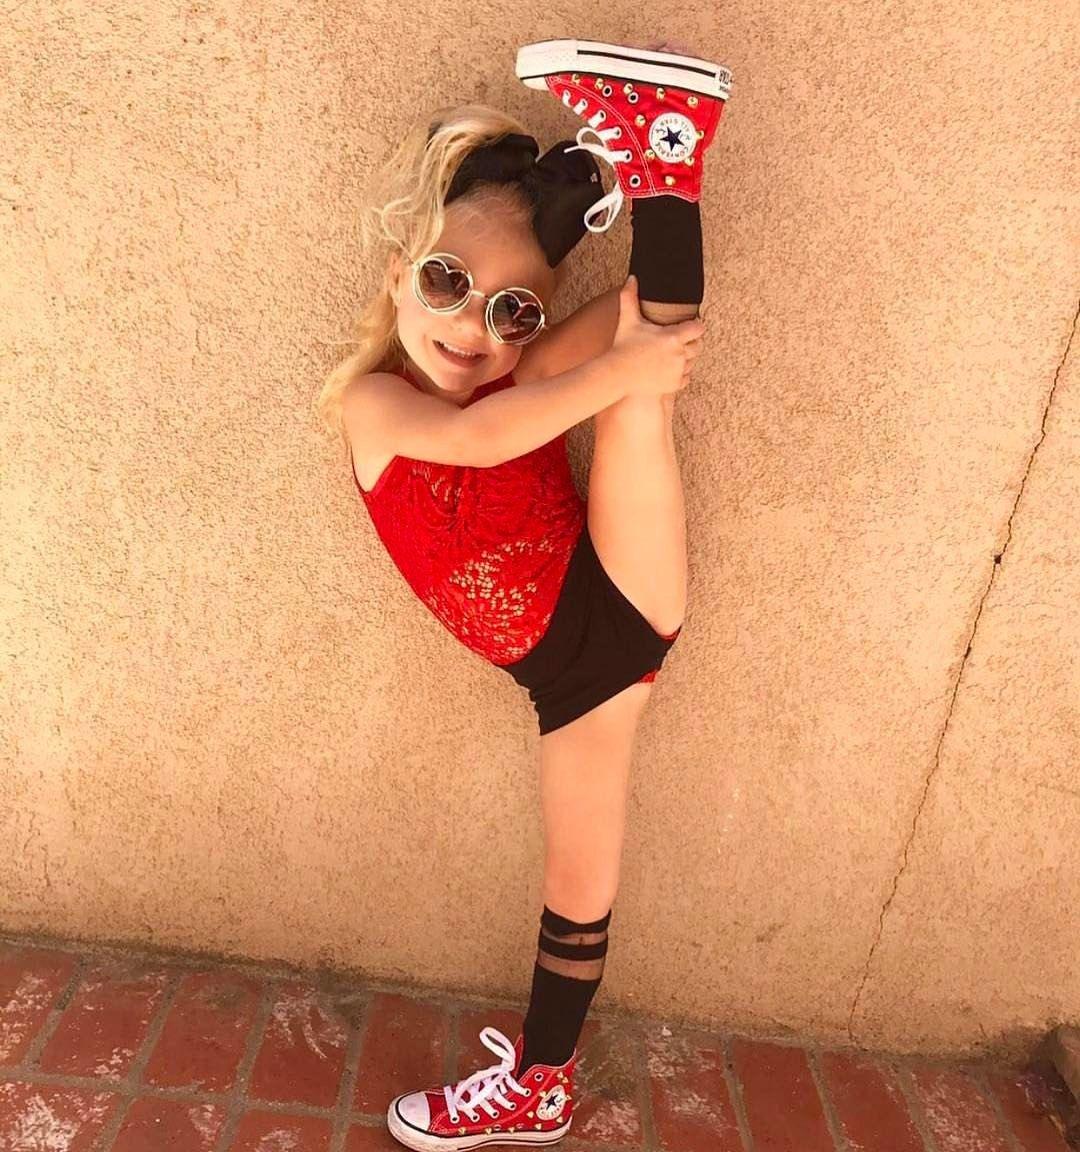 @everleighrose showing her talent with the leg hold!! So cute in our red studded converse!!!! ❤️❤️❤️❤️❤️ #iglittlestyles #spectacularkidz  #girlfashion #trendykiddies  #fashionkidsindustry #Ig_fashionkiddies #kidzootd #instafashion #kidstyle #ig_kids #kidzfashion #stylishigkids #fashionminis #kidswear #trendykidz_fashion #hipkidfashion #hipnswagkidz #stylishcutefashionkids  #cutekidsclub #fashionista #kidswithstyle #kidfashion #kidsstylezz #kidsneakerheads #springfashion #ins